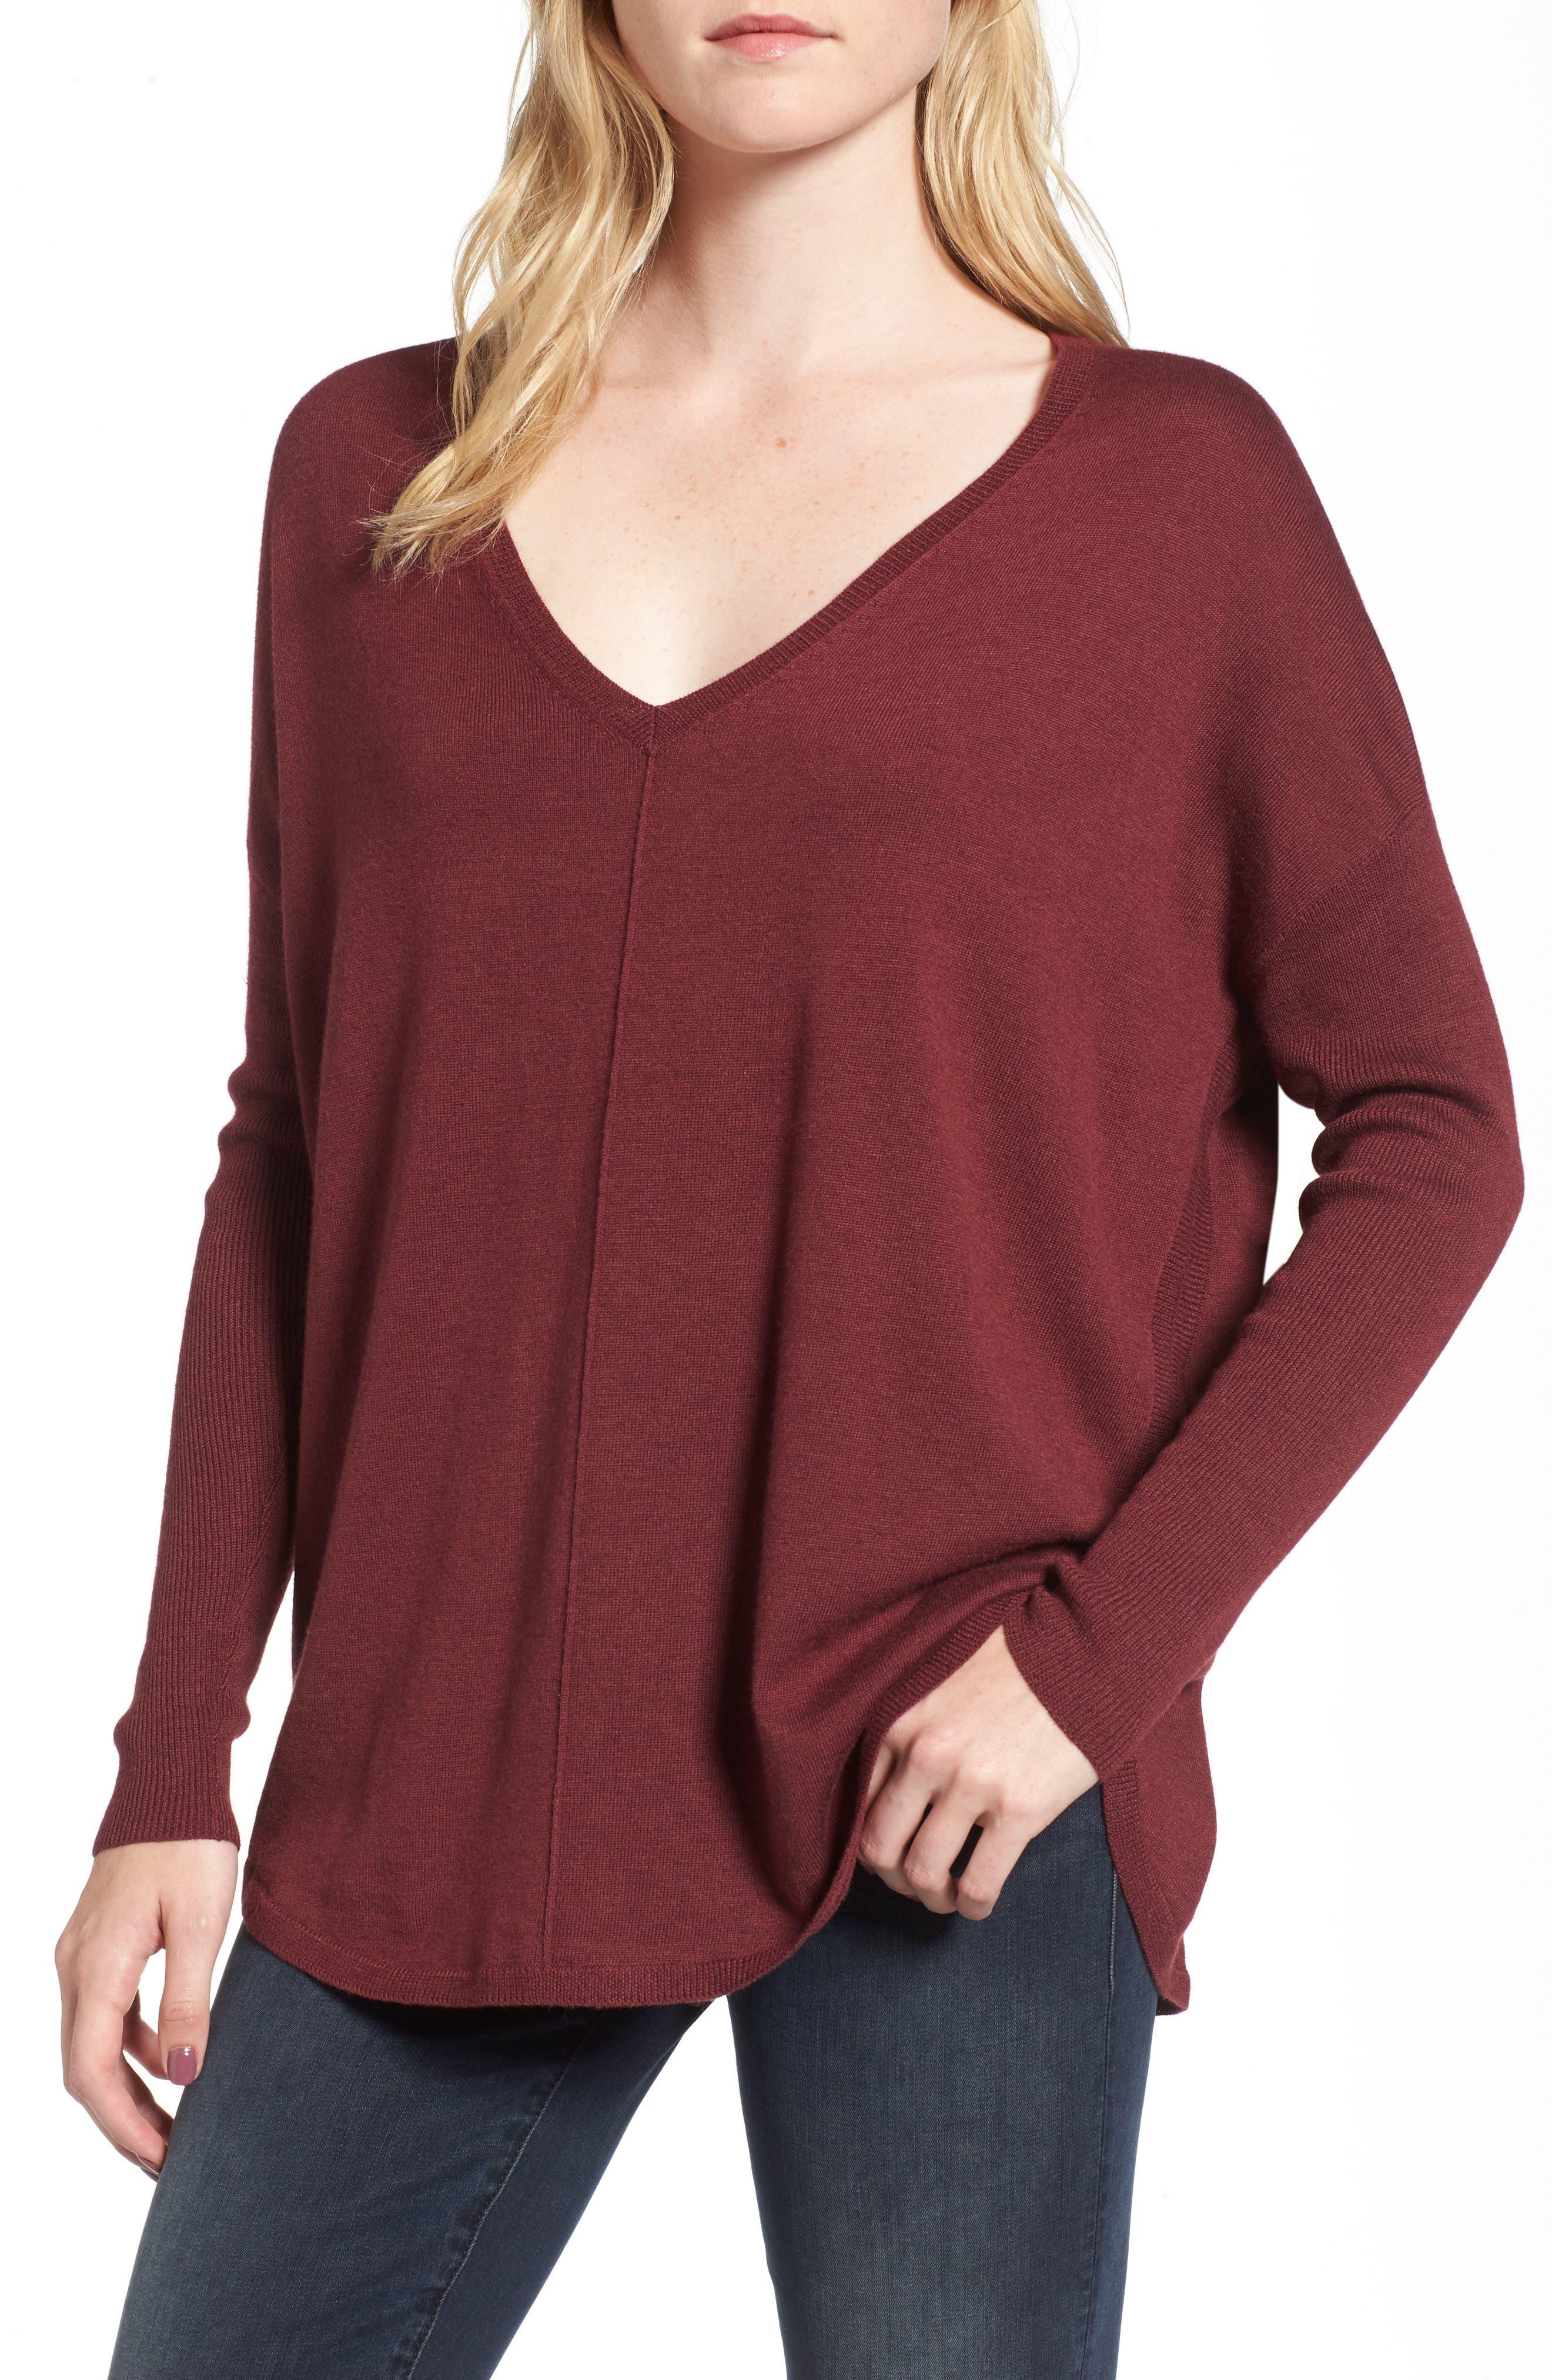 'Everyday' V-Neck Sweater,                             Main thumbnail 1, color,                             Burgundy London